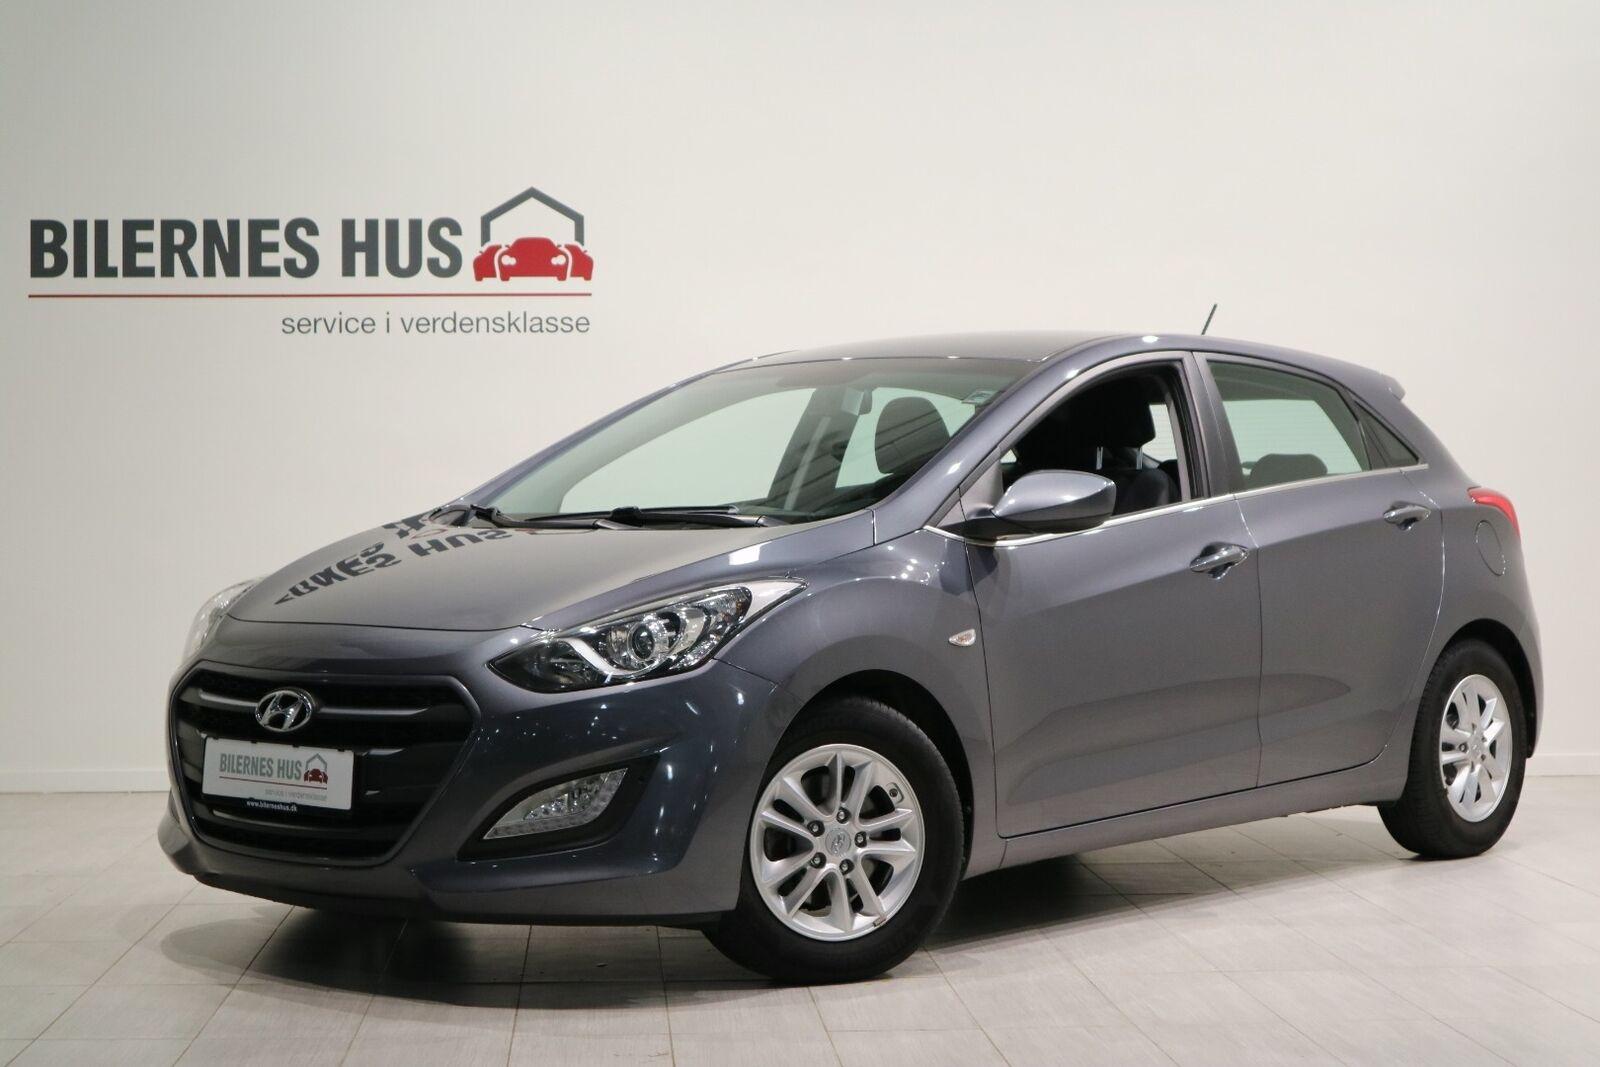 Hyundai i30 Billede 2